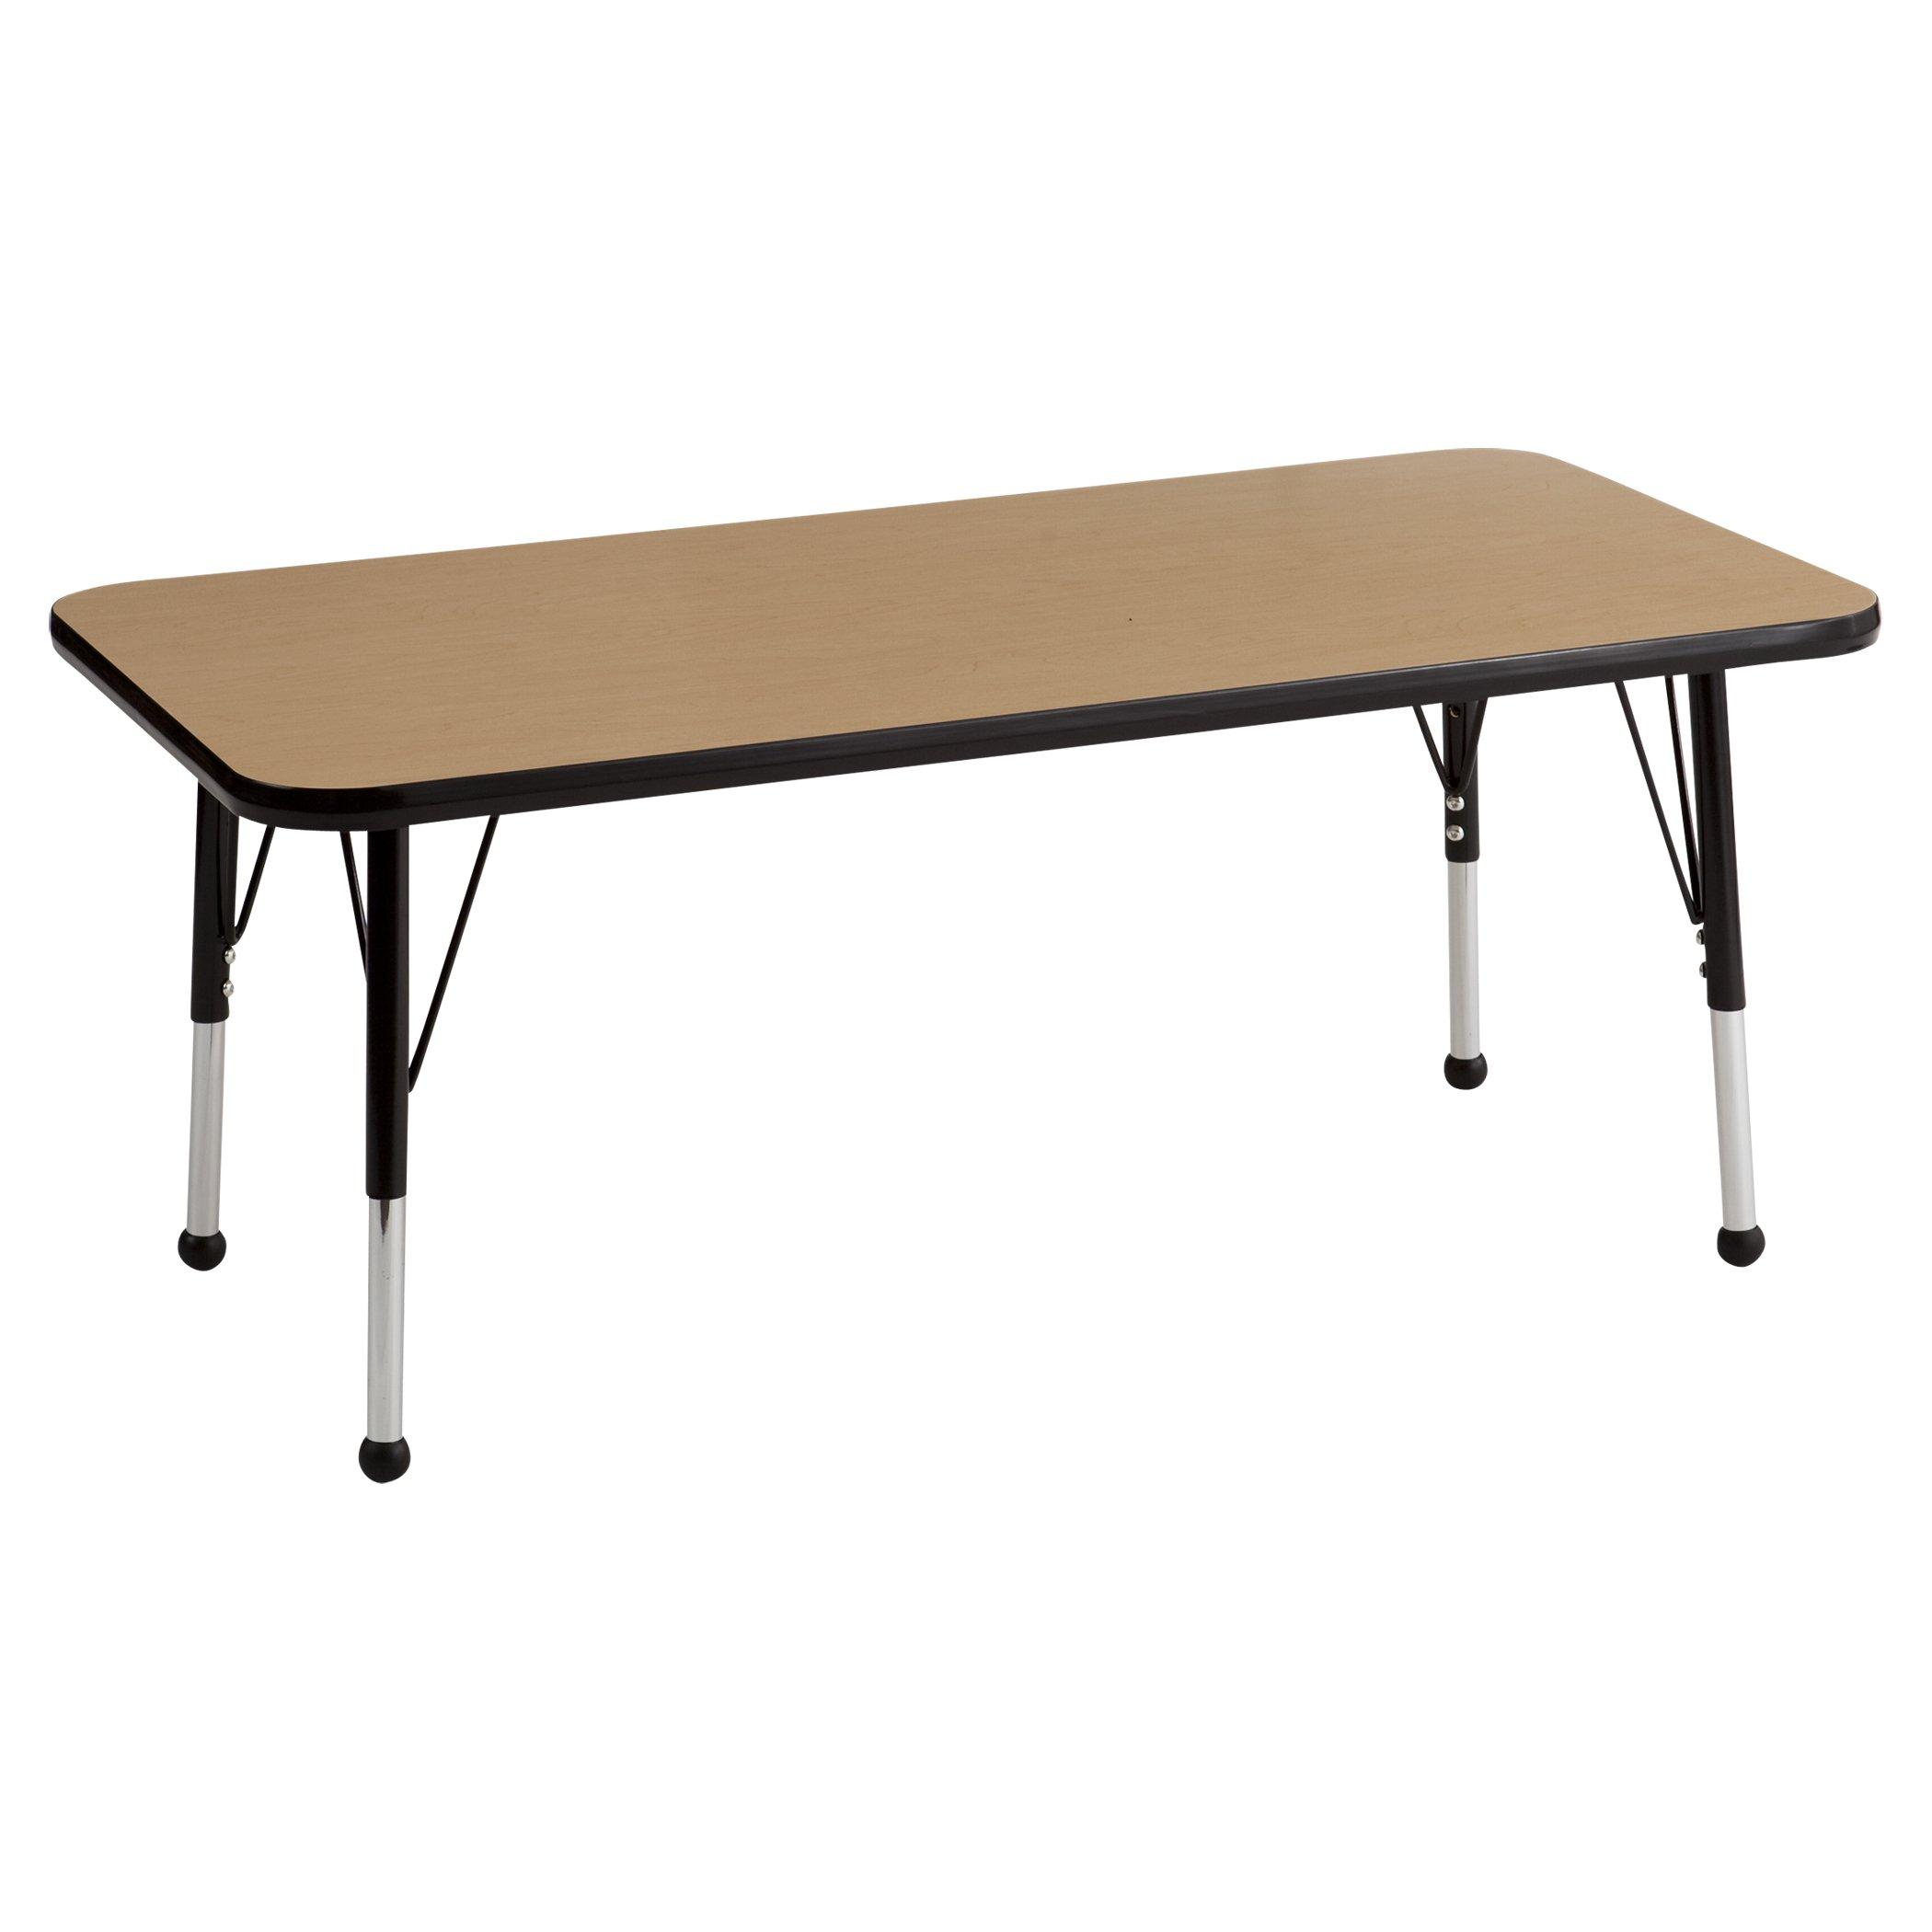 ECR4Kids 24'' x 48'' Rectangular Activity School Table, Standard Legs w/Ball Glides, Adjustable Height 19-30 inch (Oak/Black)